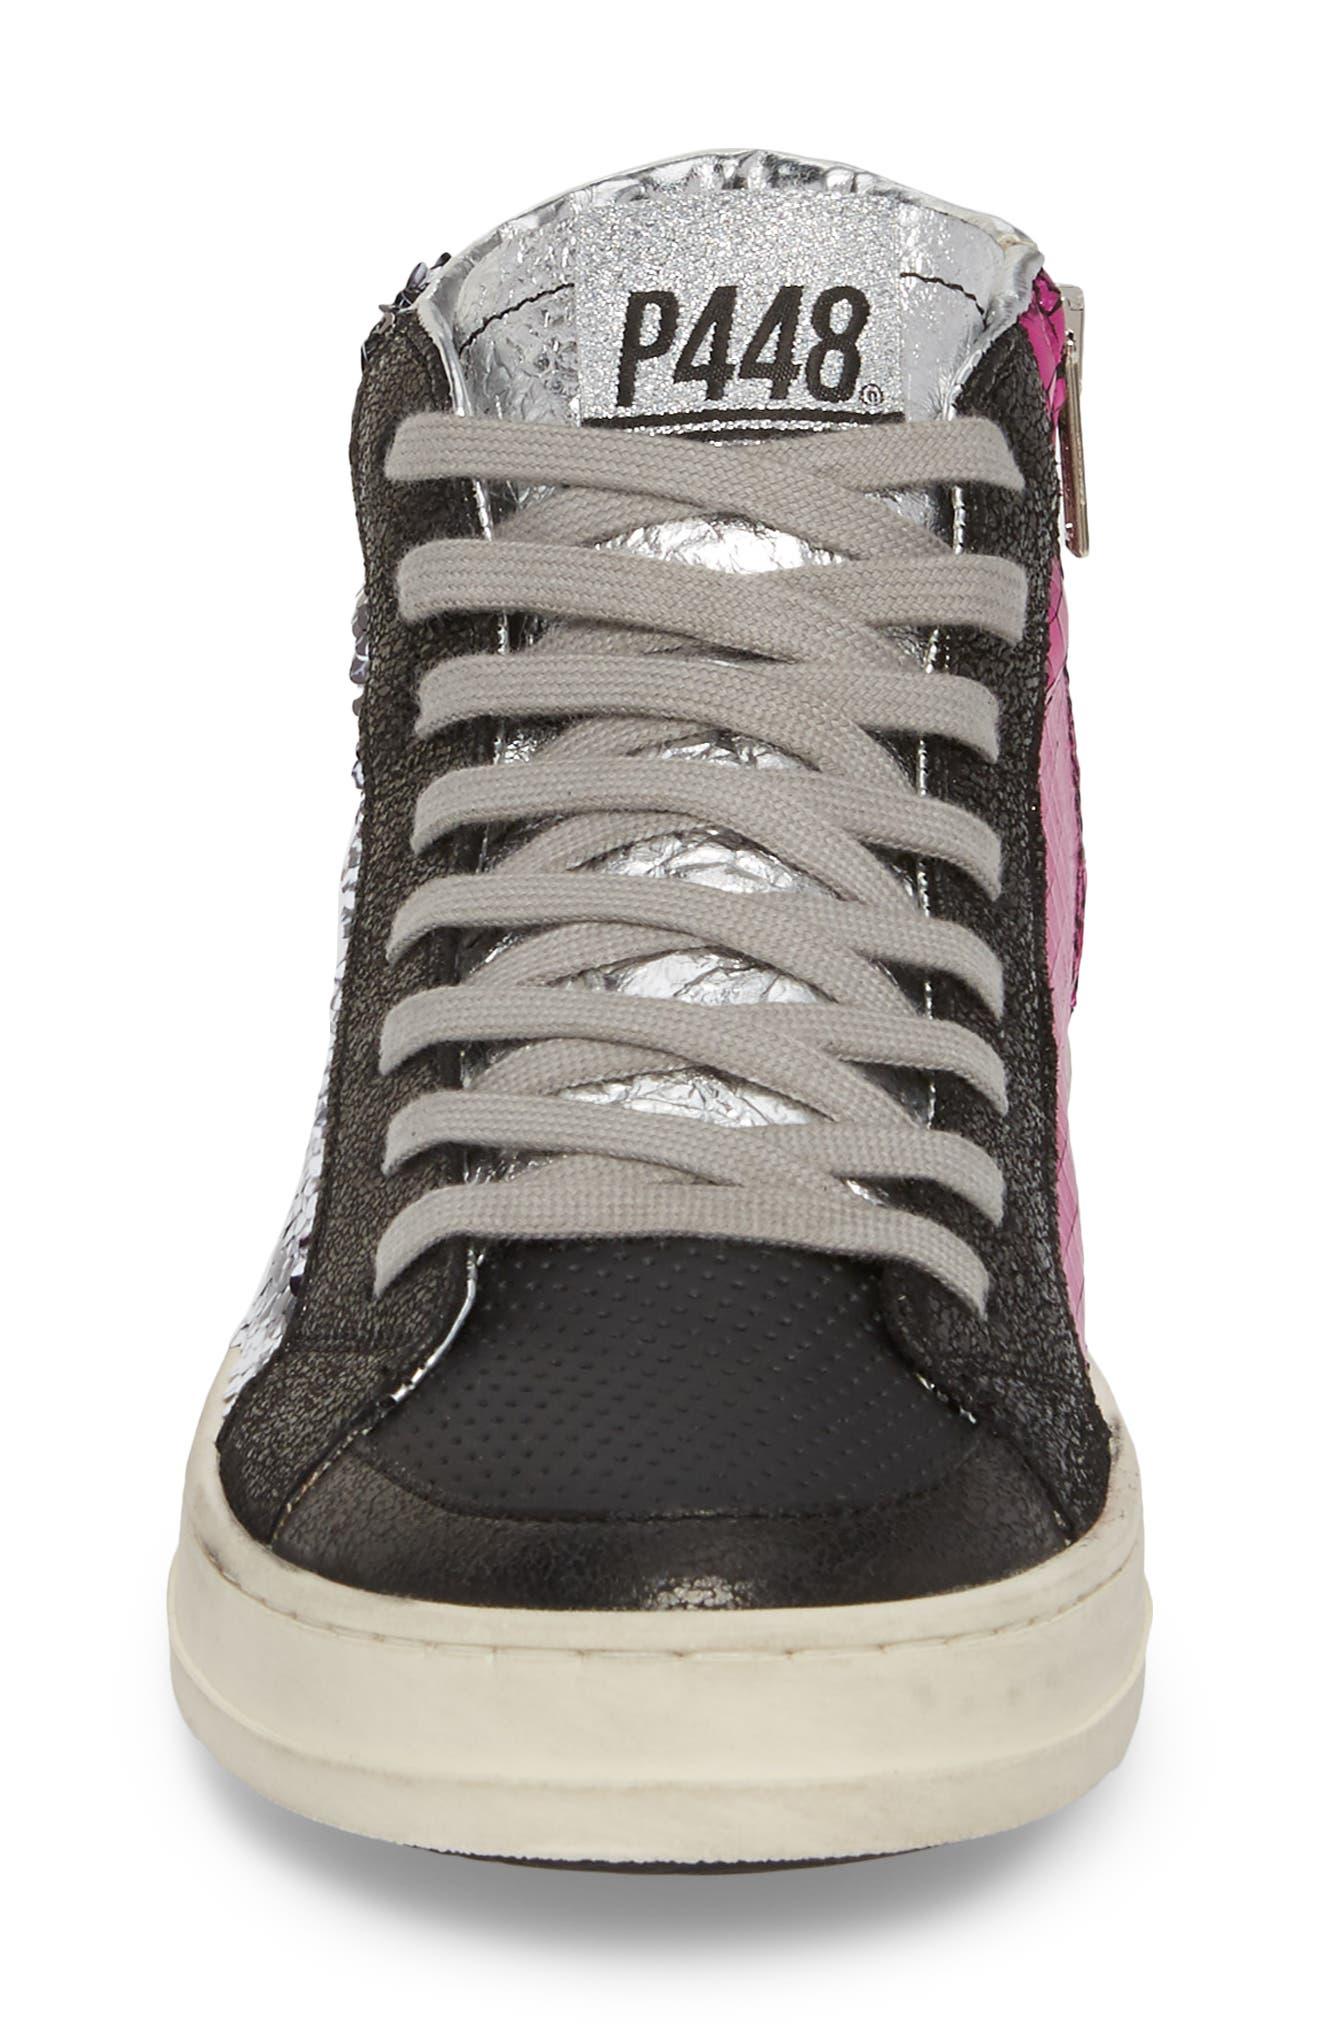 Skate Sequin High Top Sneaker,                             Alternate thumbnail 4, color,                             Paillettes